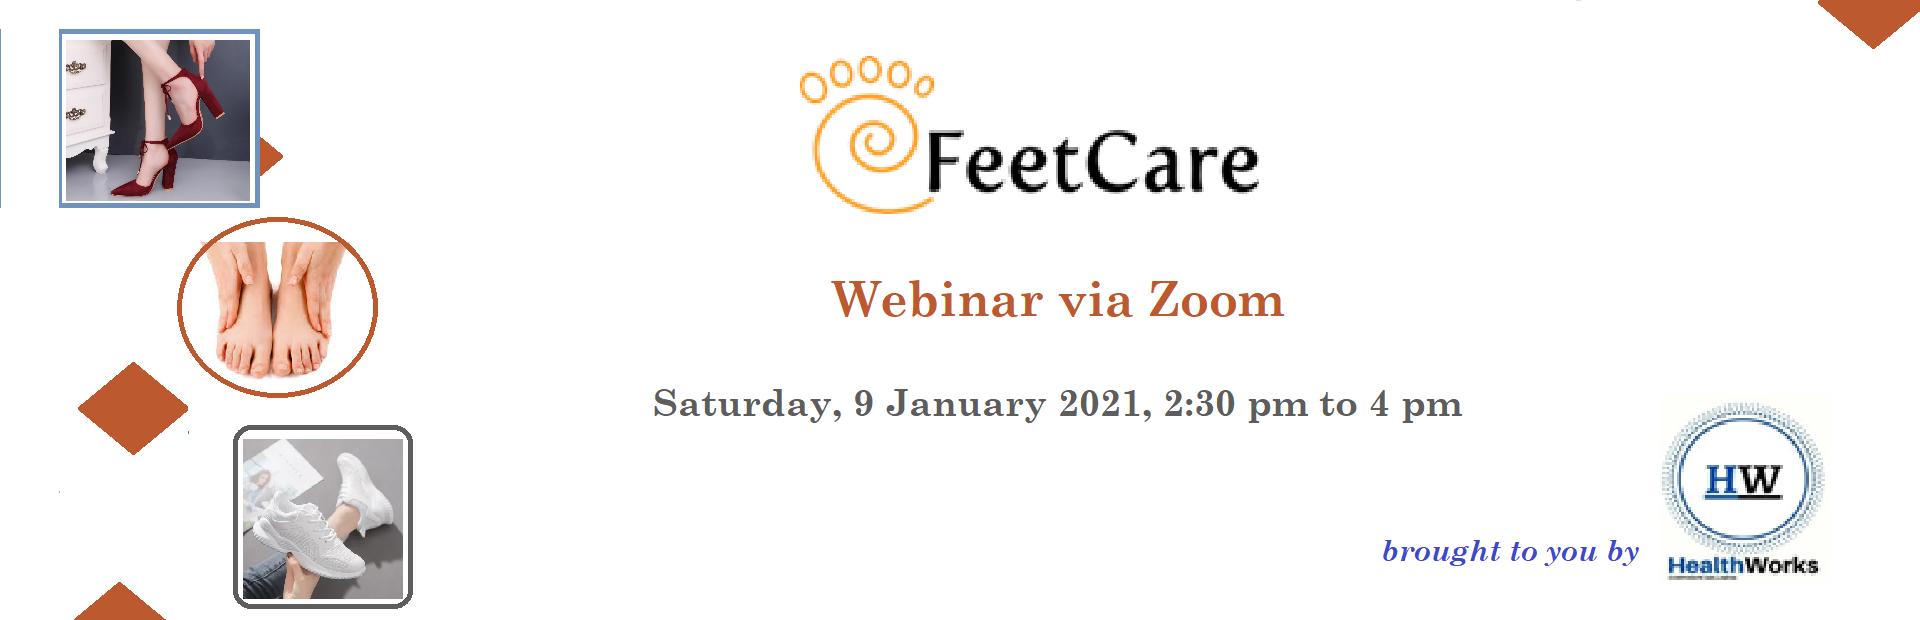 Feetcare_banner_9_Jan_21_3